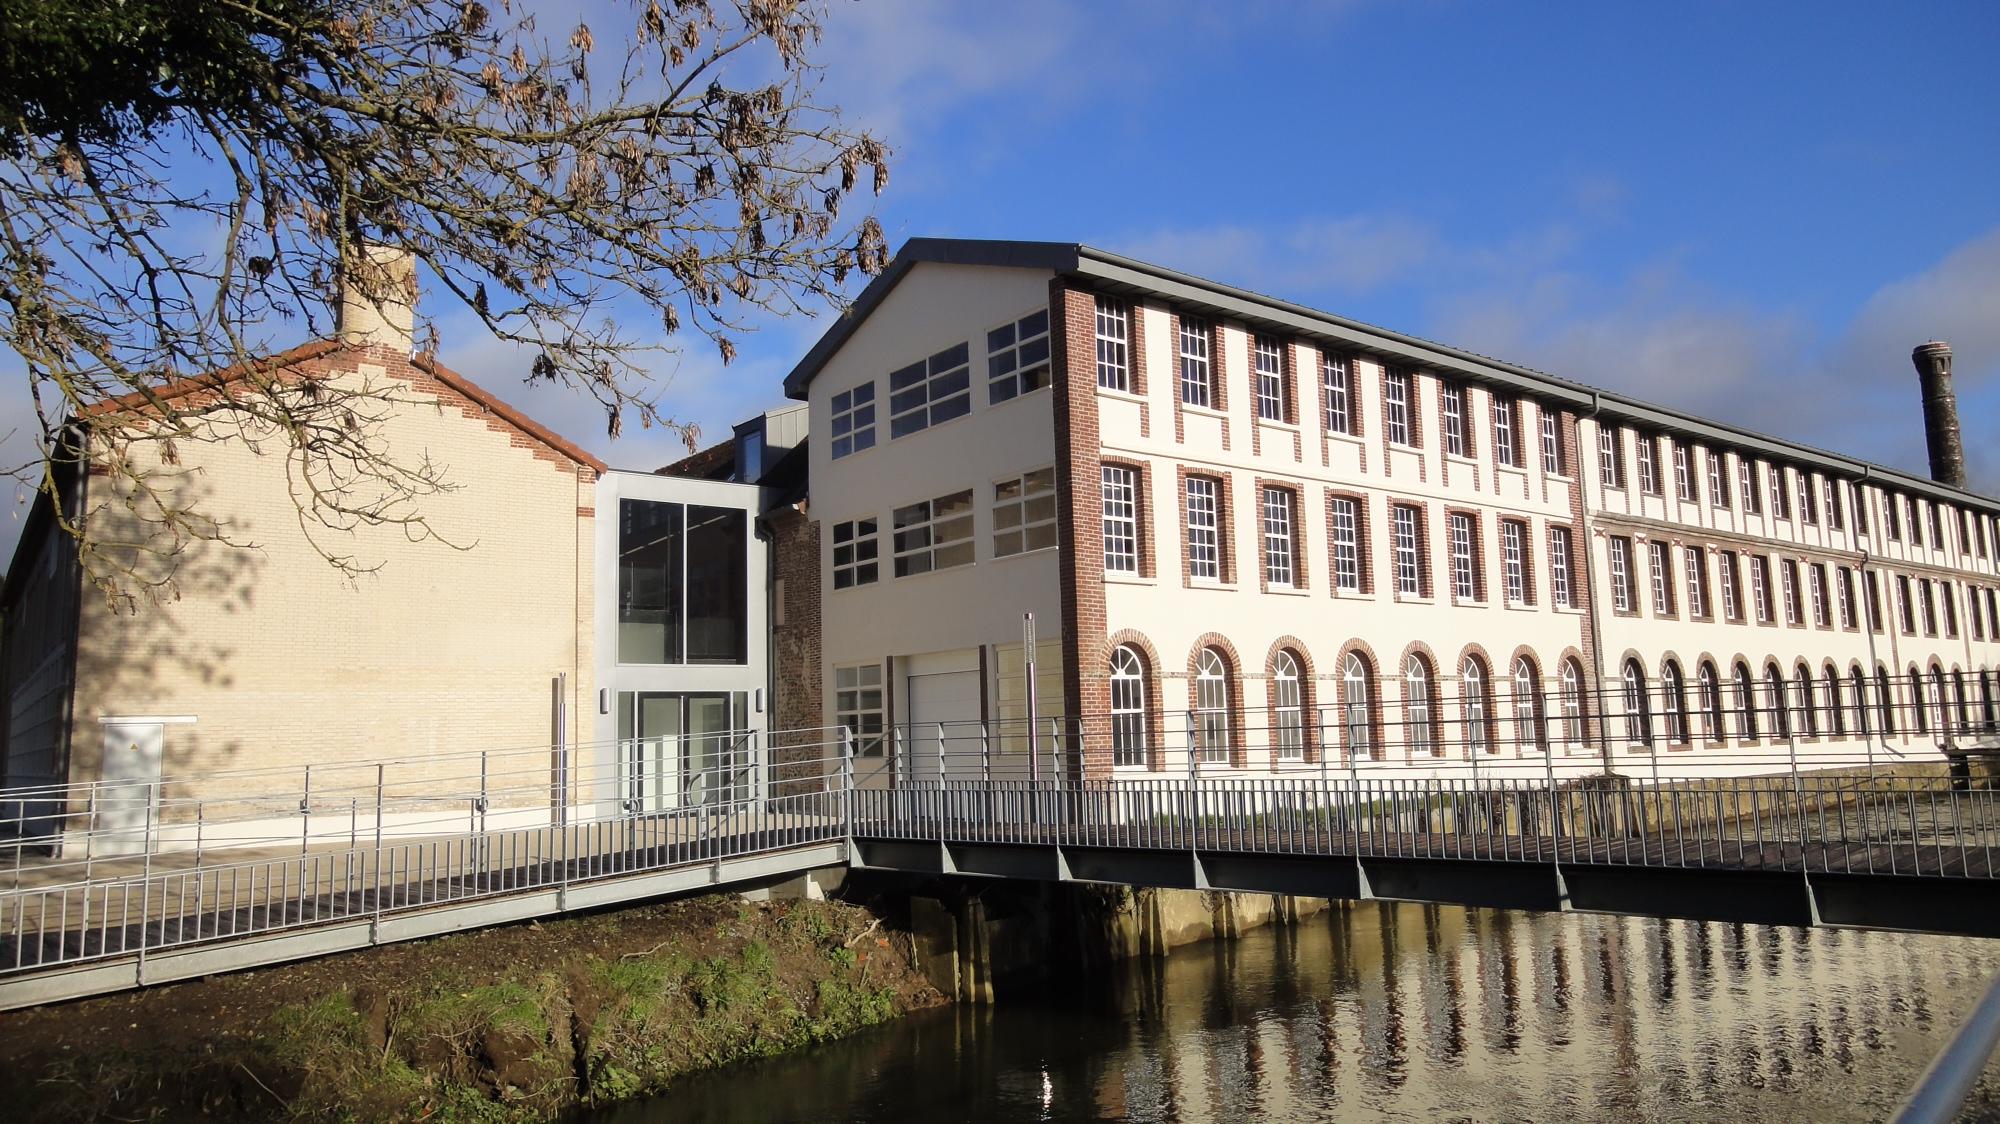 la-manufacture-bohin-facade-jean-marie-mandon